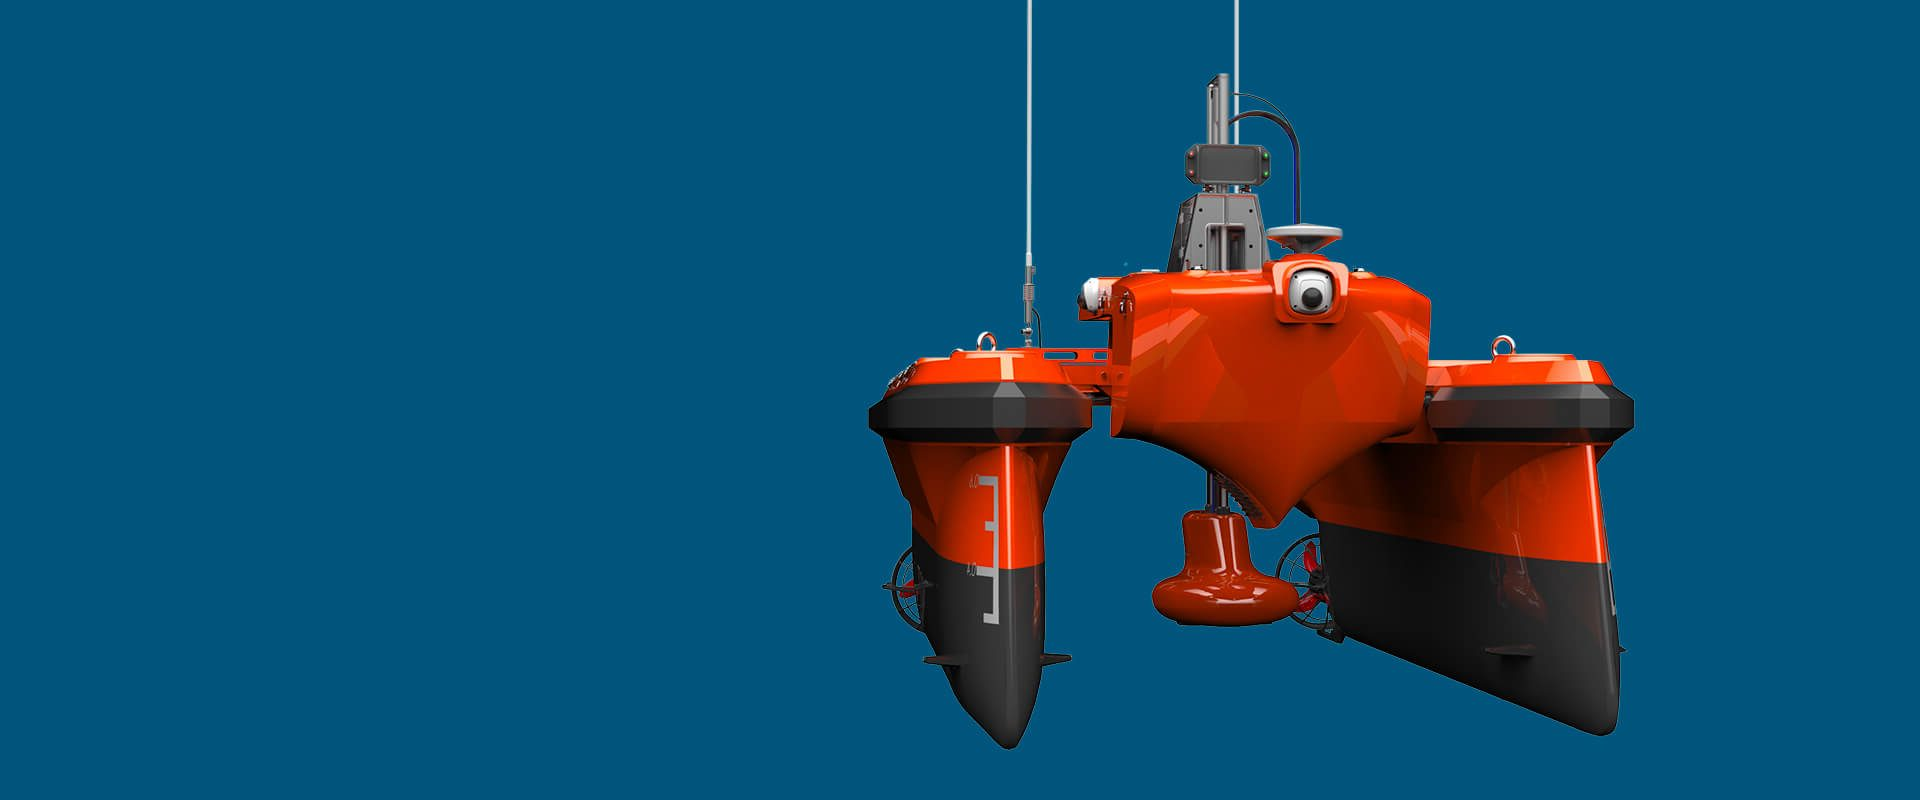 M40 06 maintenance e1551941706719